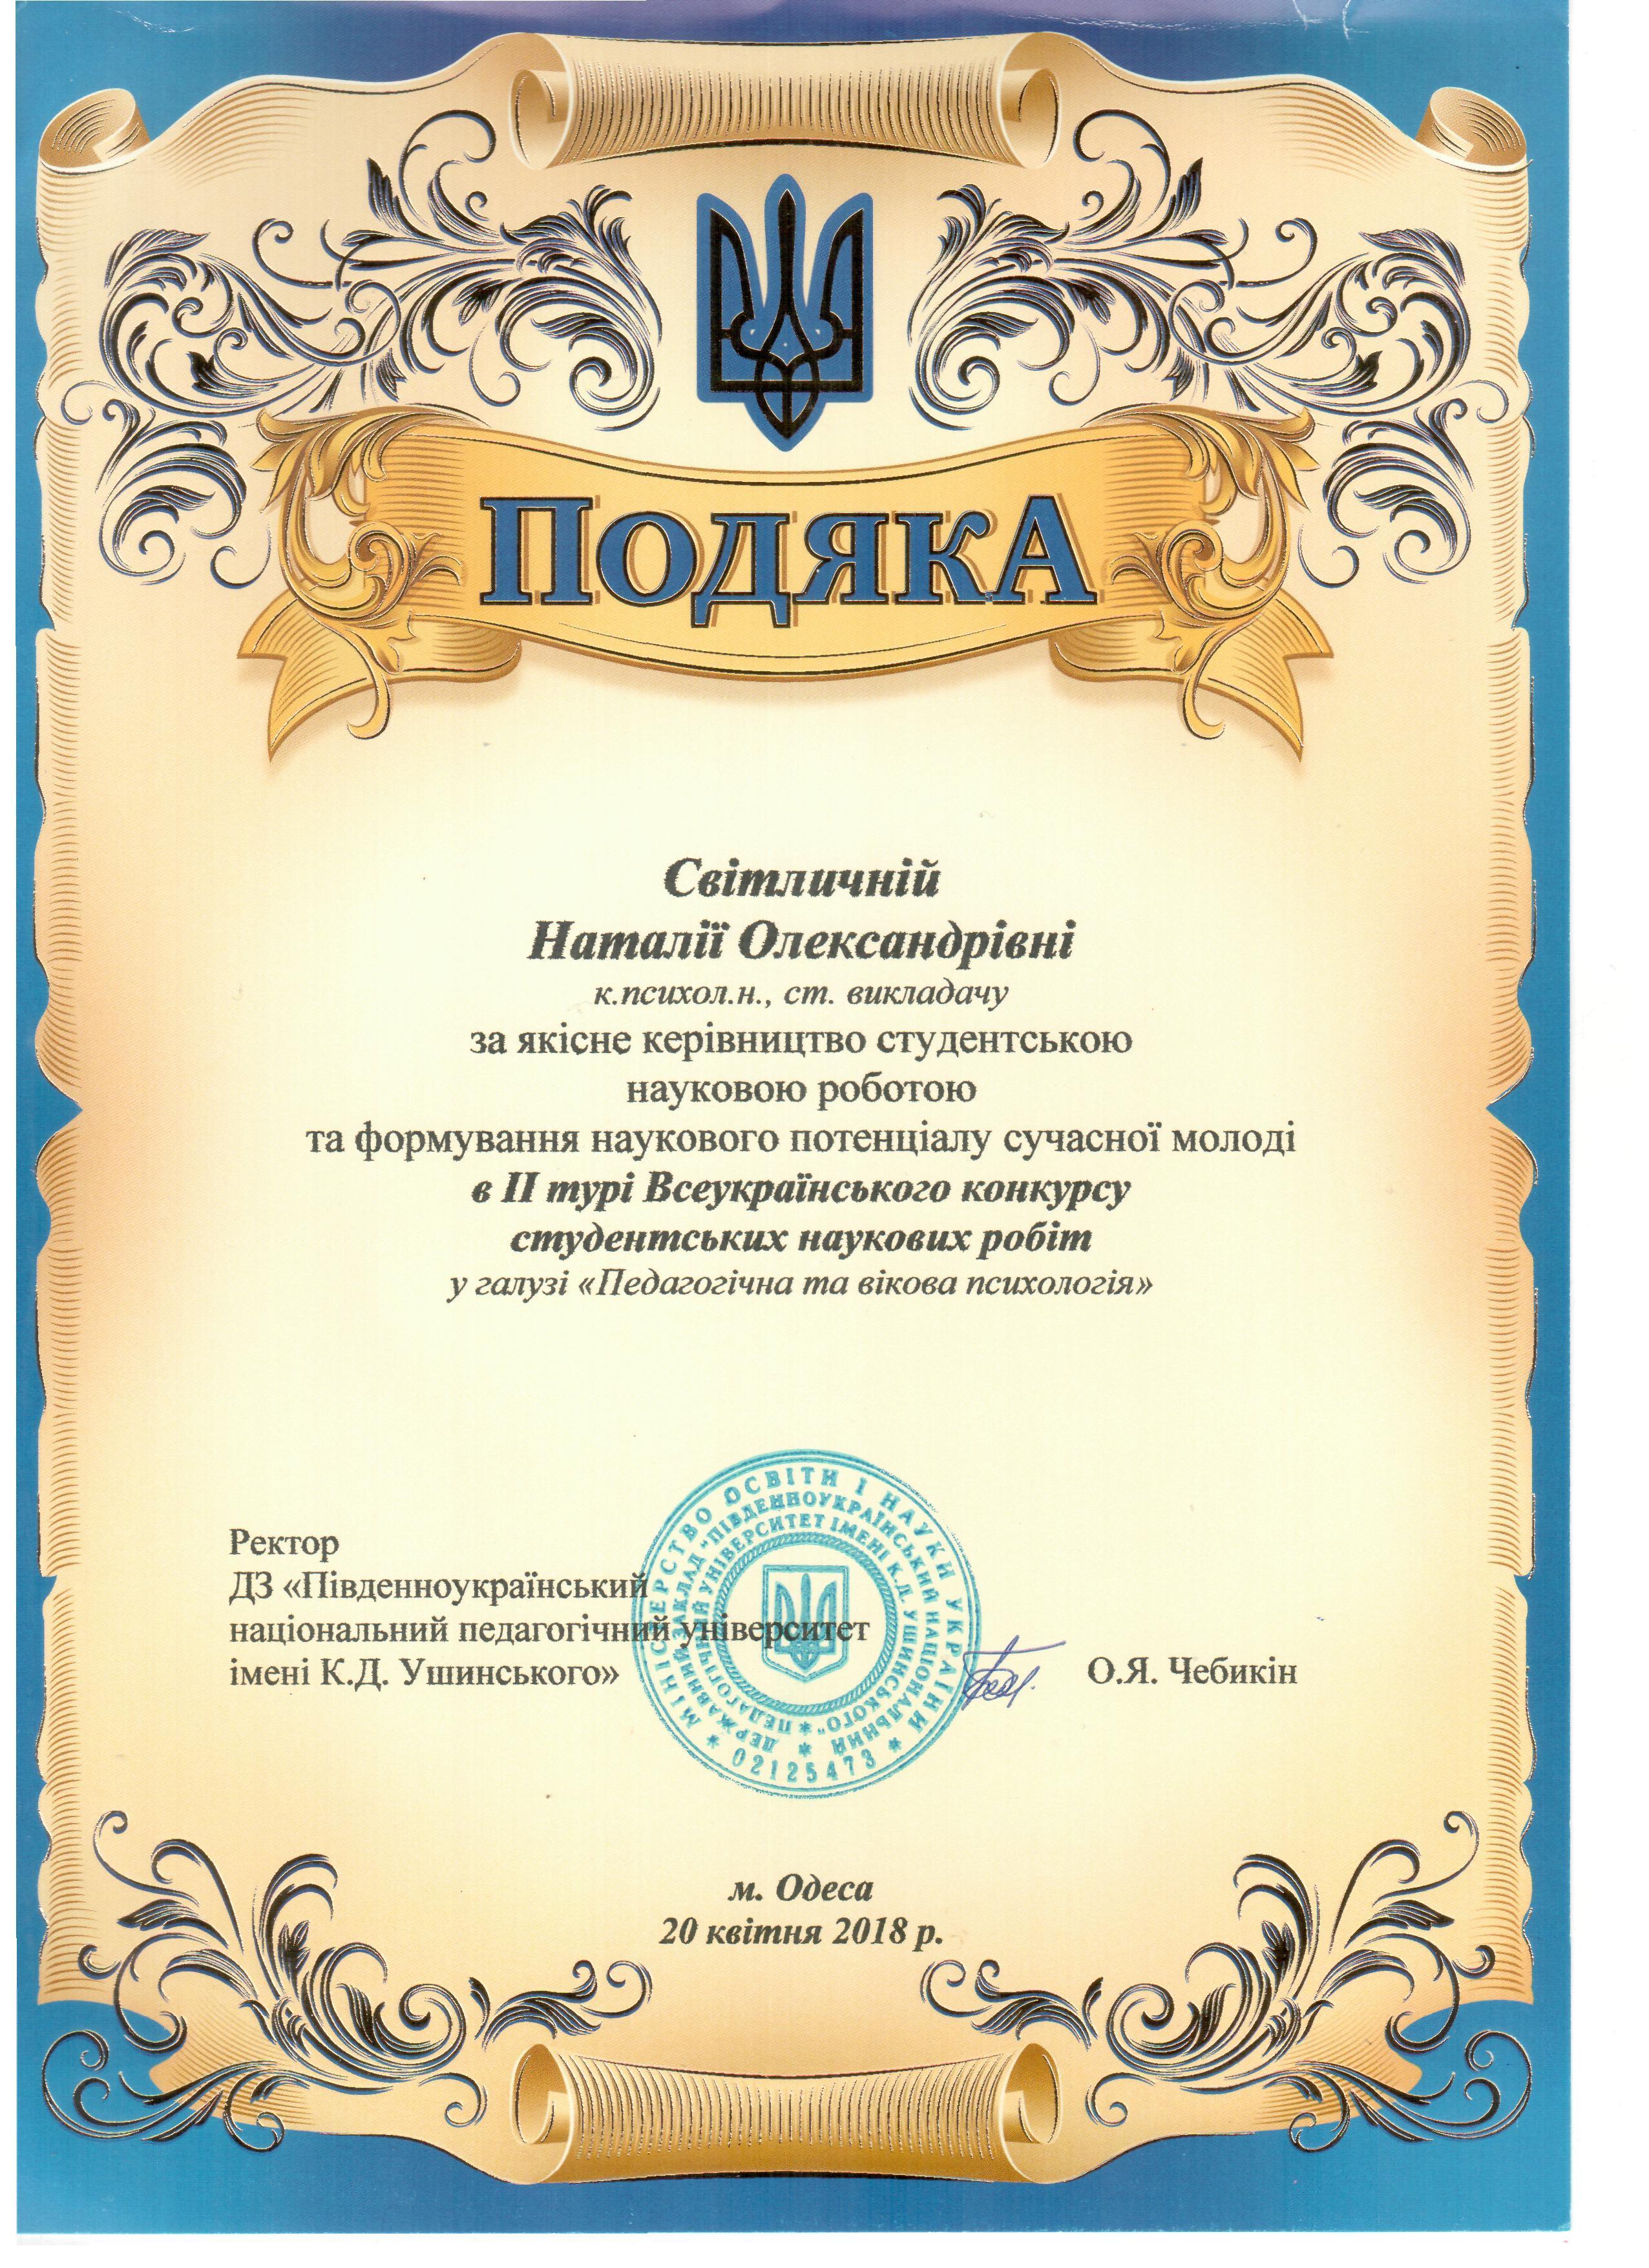 http://edu-mns.org.ua/img/news/7723/Podyaka.jpg